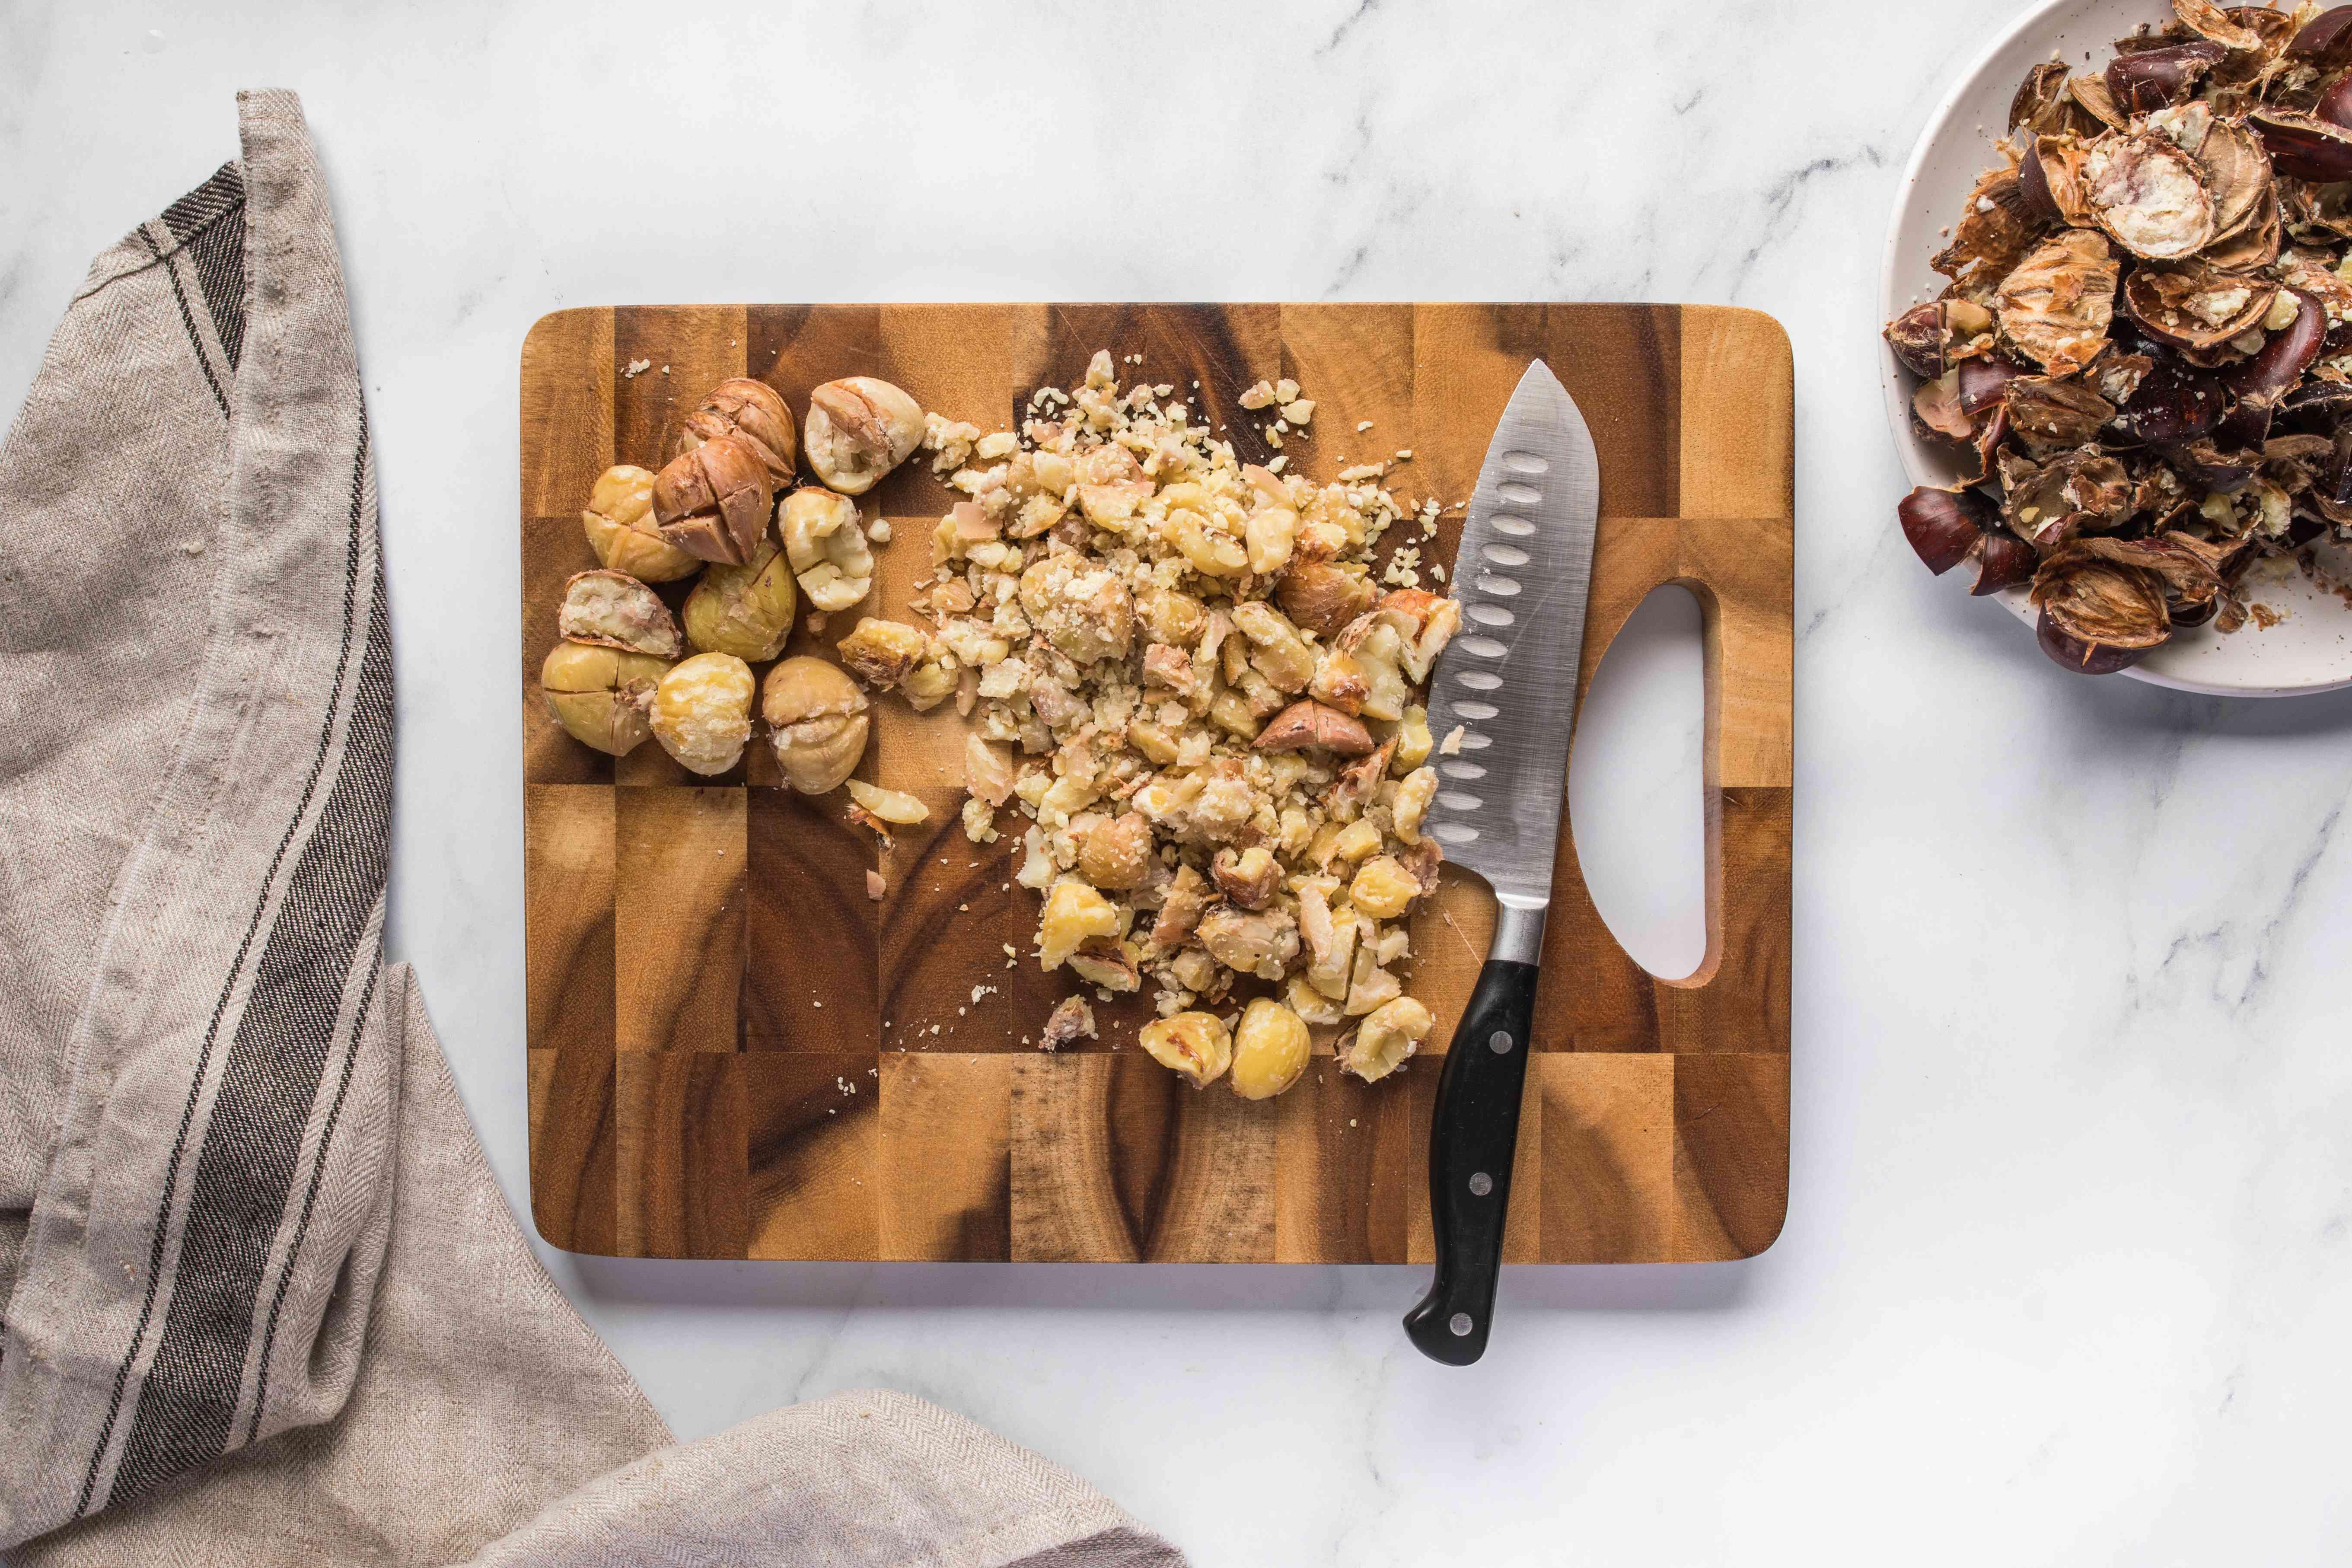 Peel chestnuts